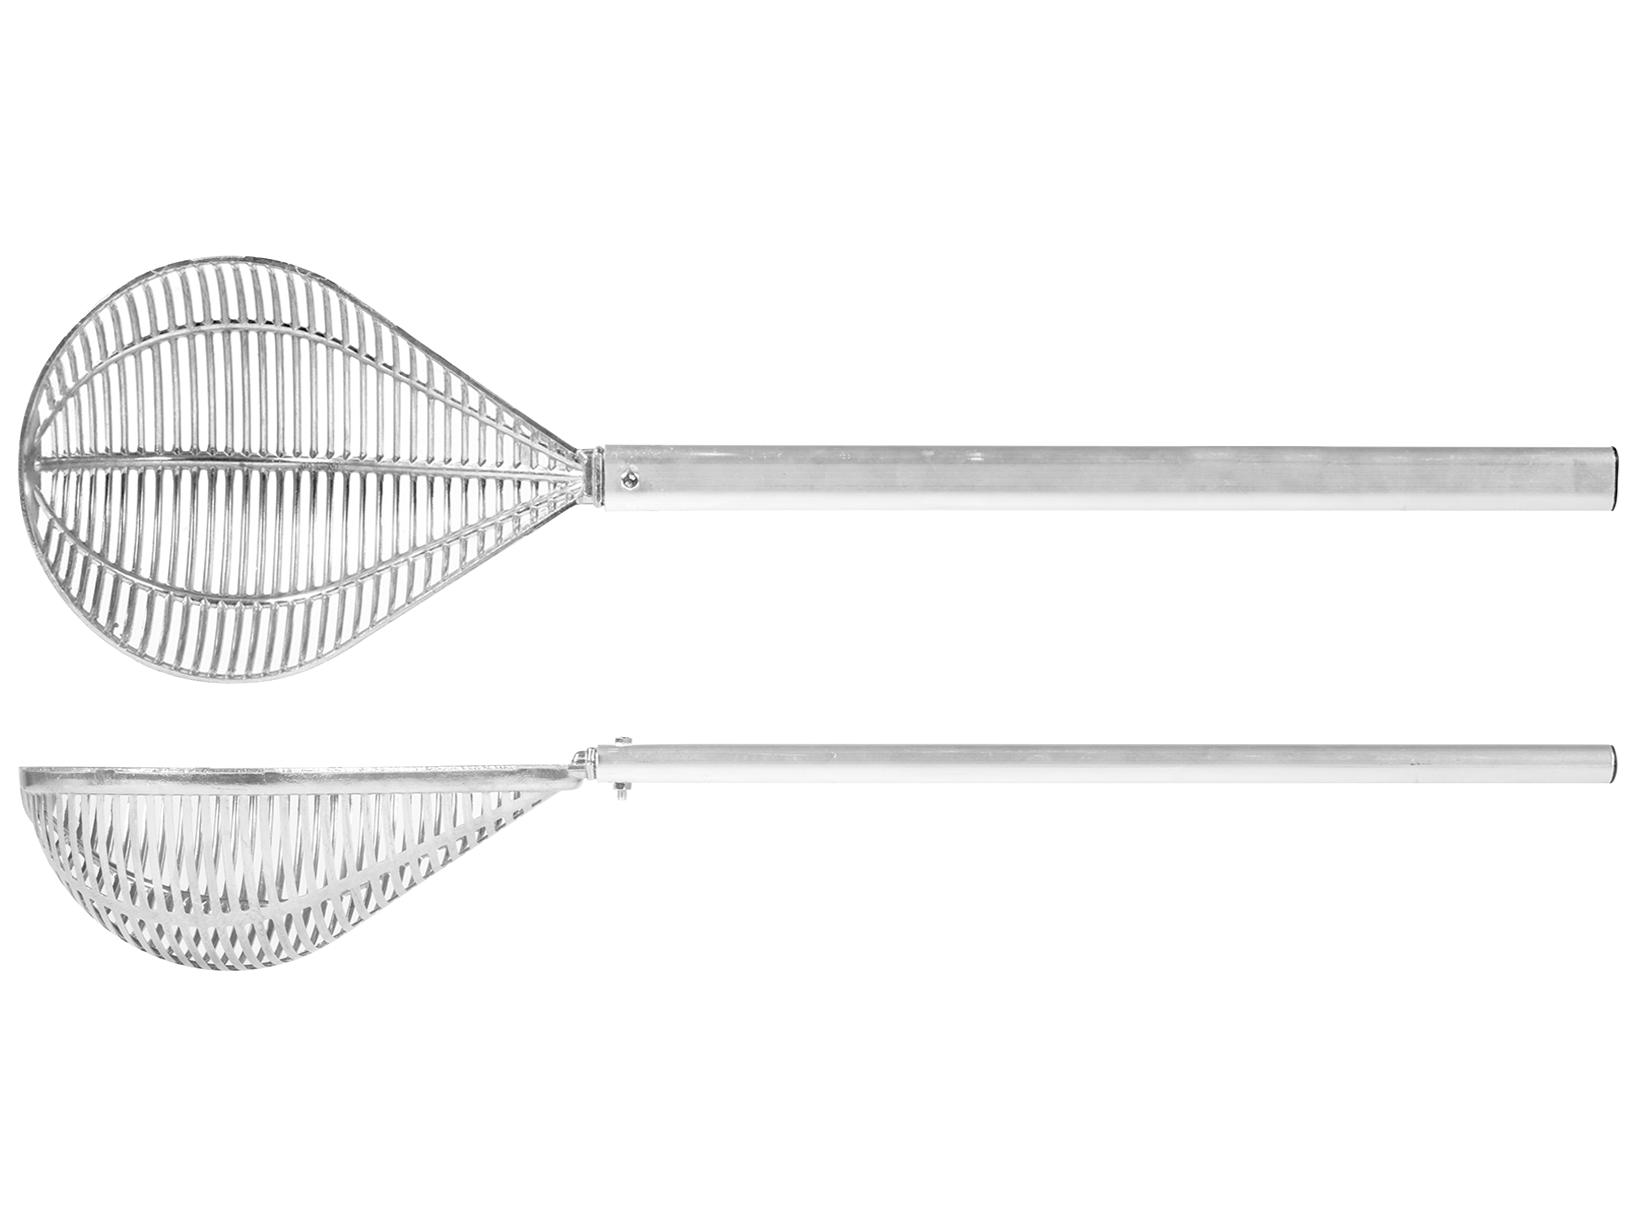 Colapomodori Manico Lungo In Alluminio Cm50